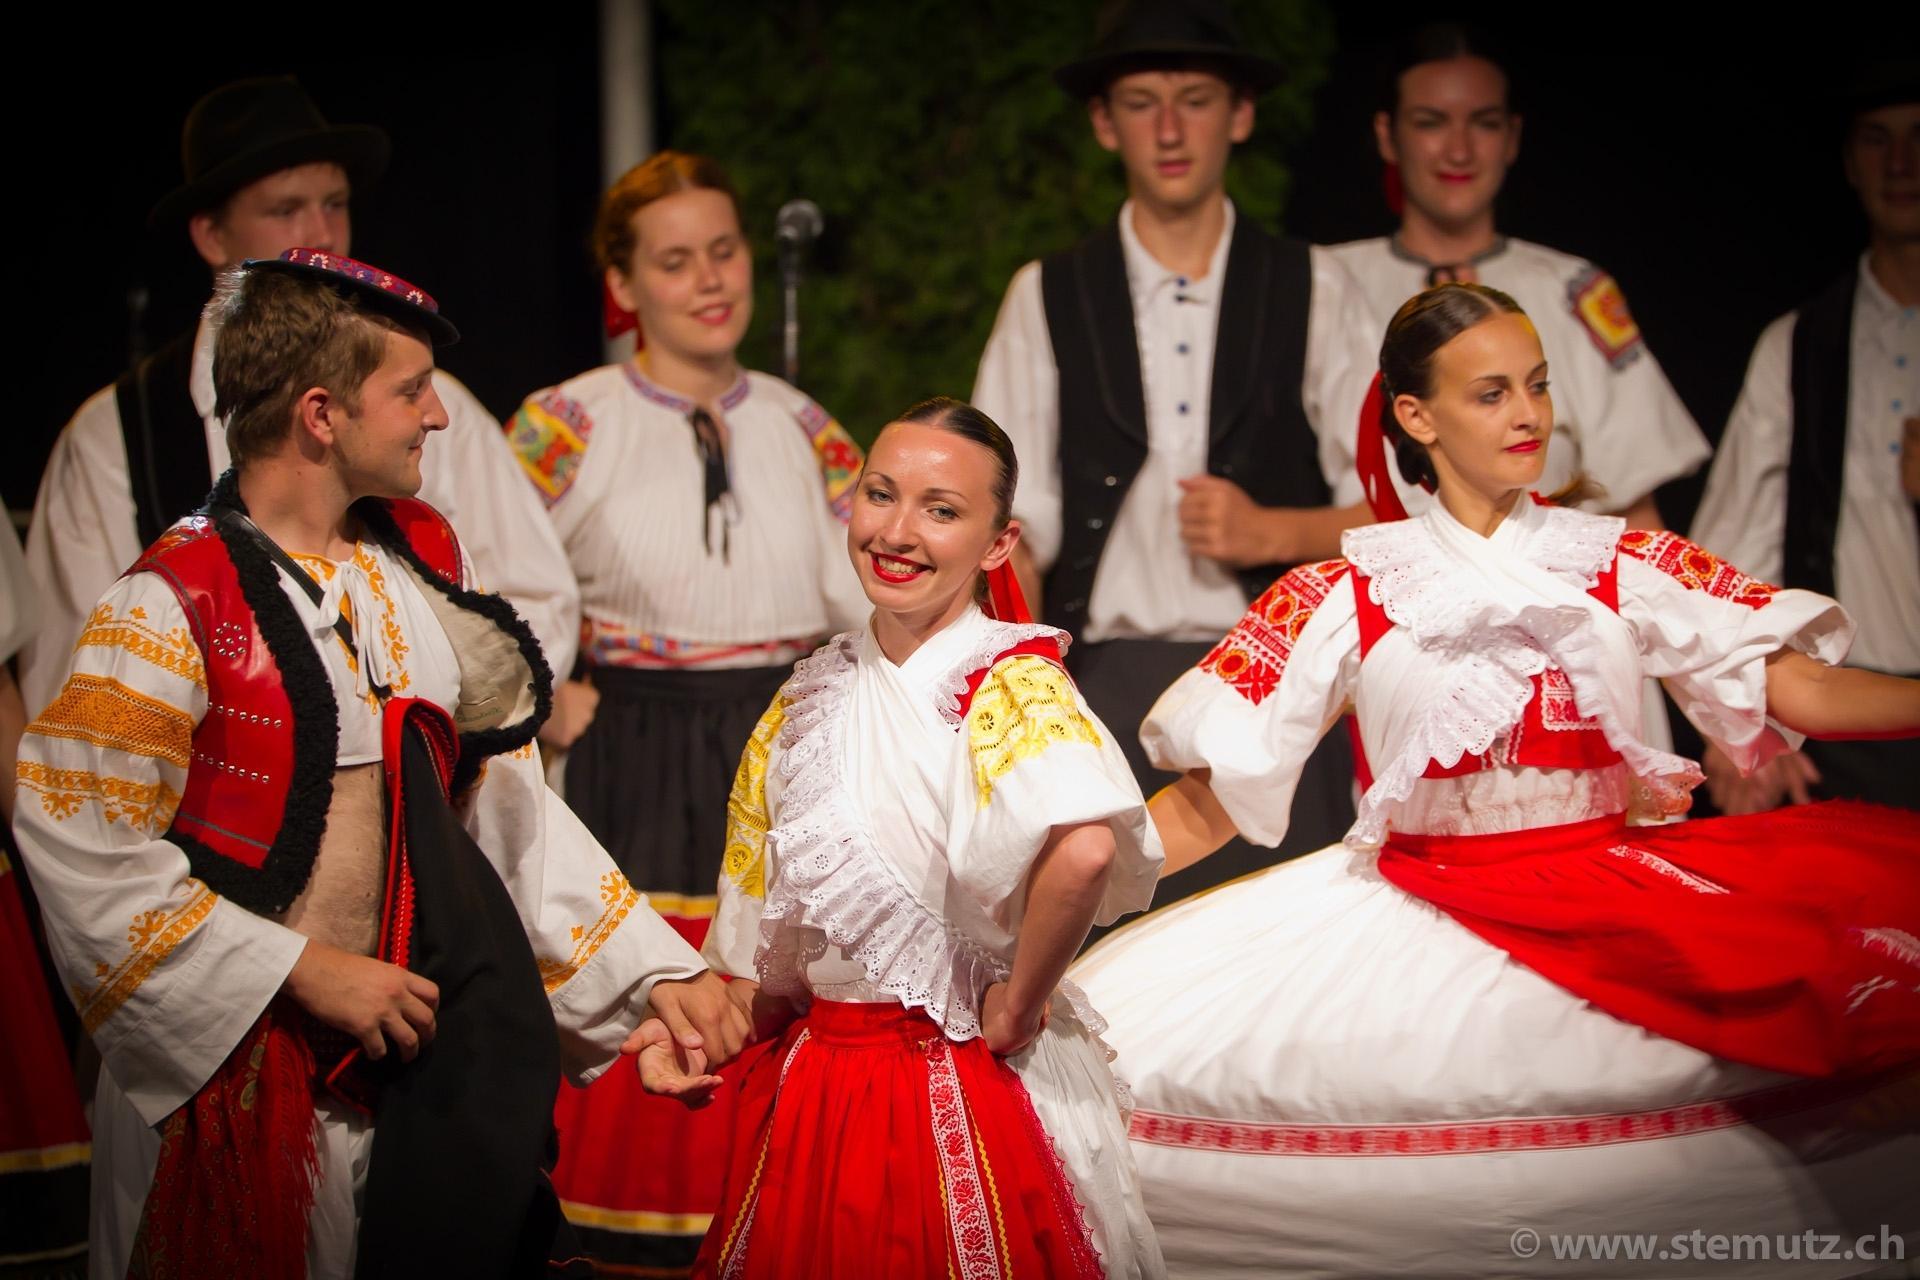 rfi rencontres de folklore internationales fribourg suisse)